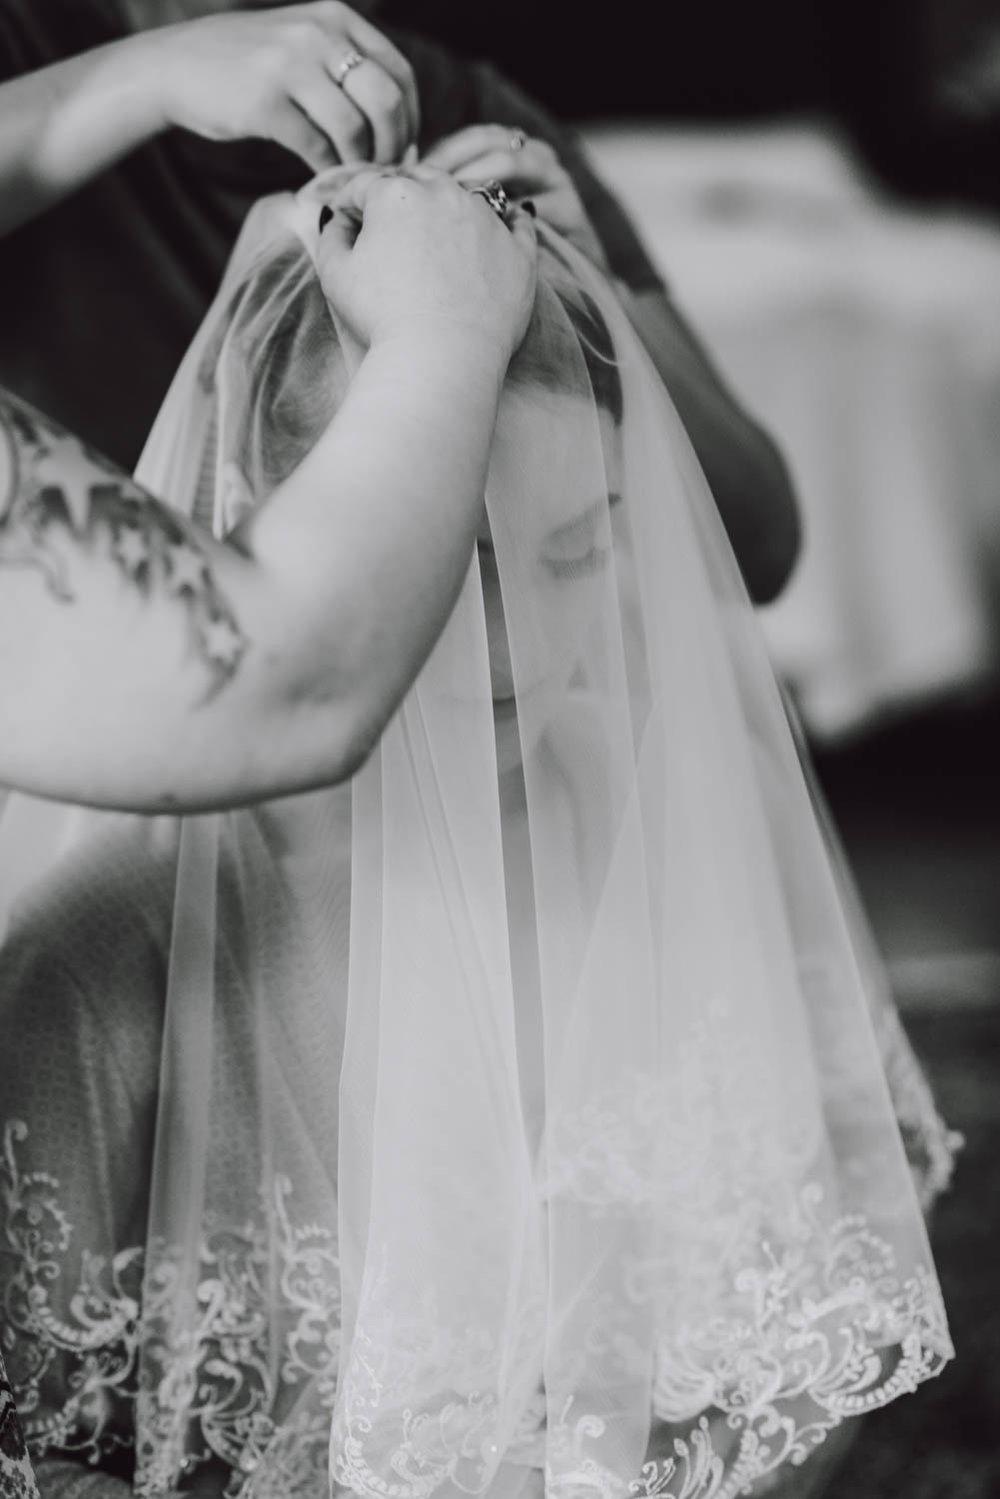 ecaterina-chandu-dondeti-wedding-photography9.jpg